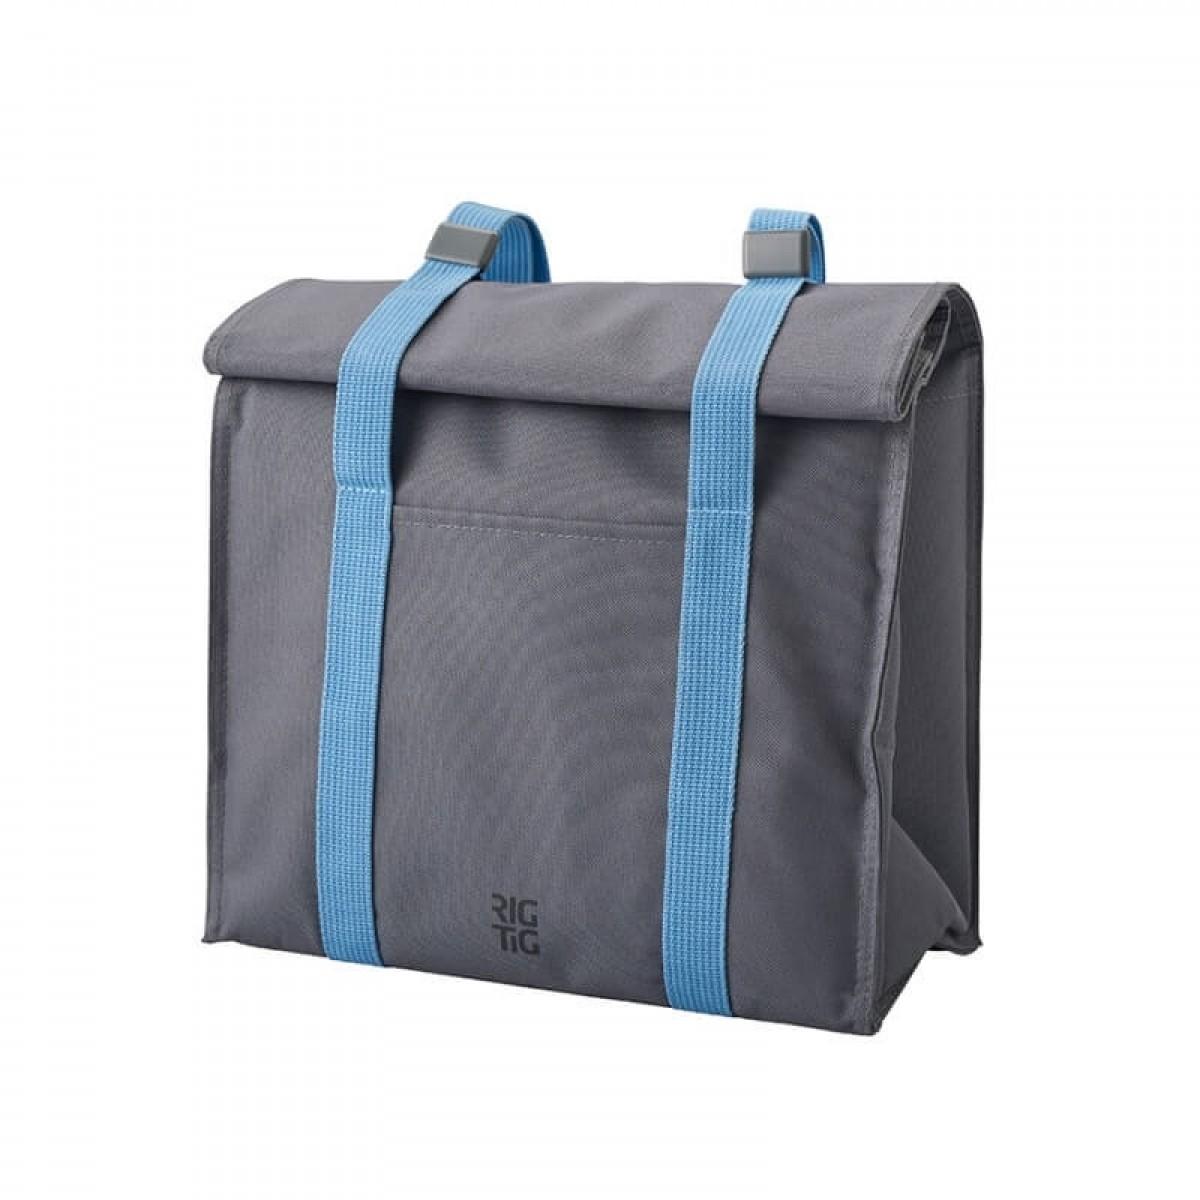 STELTON RIG-TIG Køletaske grå/blå